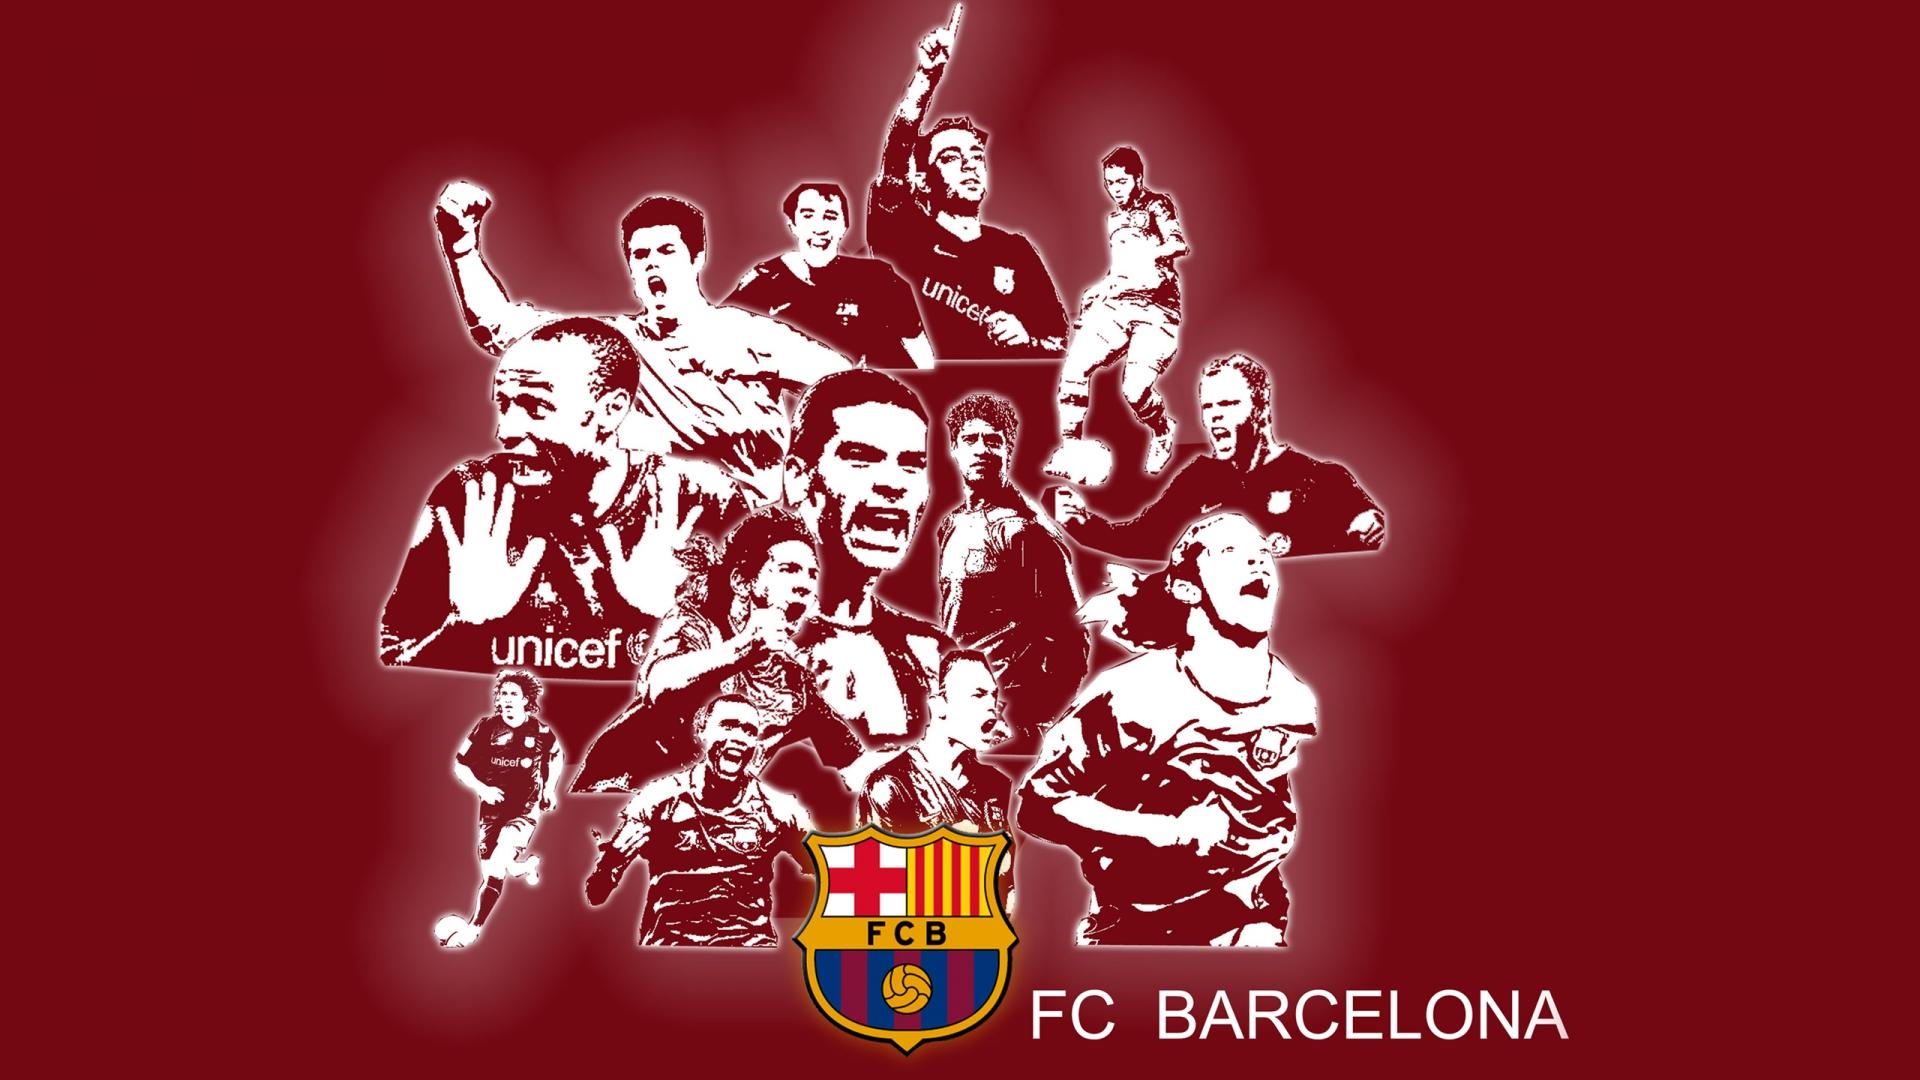 Barca Girl Wallpaper Fc Barcelona High Definition Wallpapers Hd Wallpapers